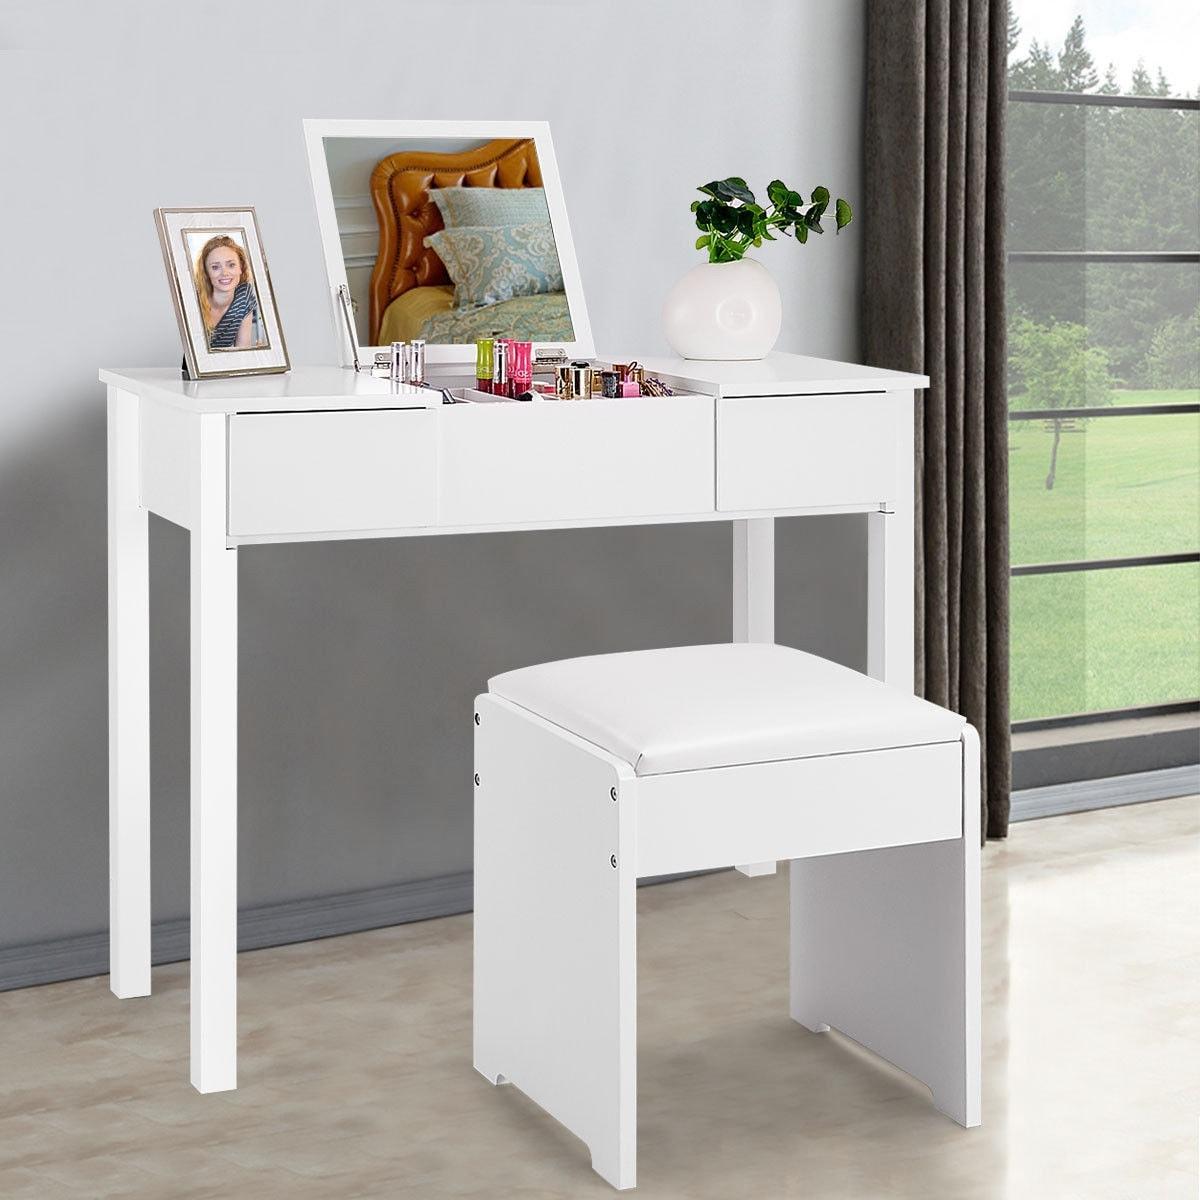 half off e5764 48616 Costway White Vanity Dressing Table Set Mirrored bathroom Furniture W/Stool  &Storage Box